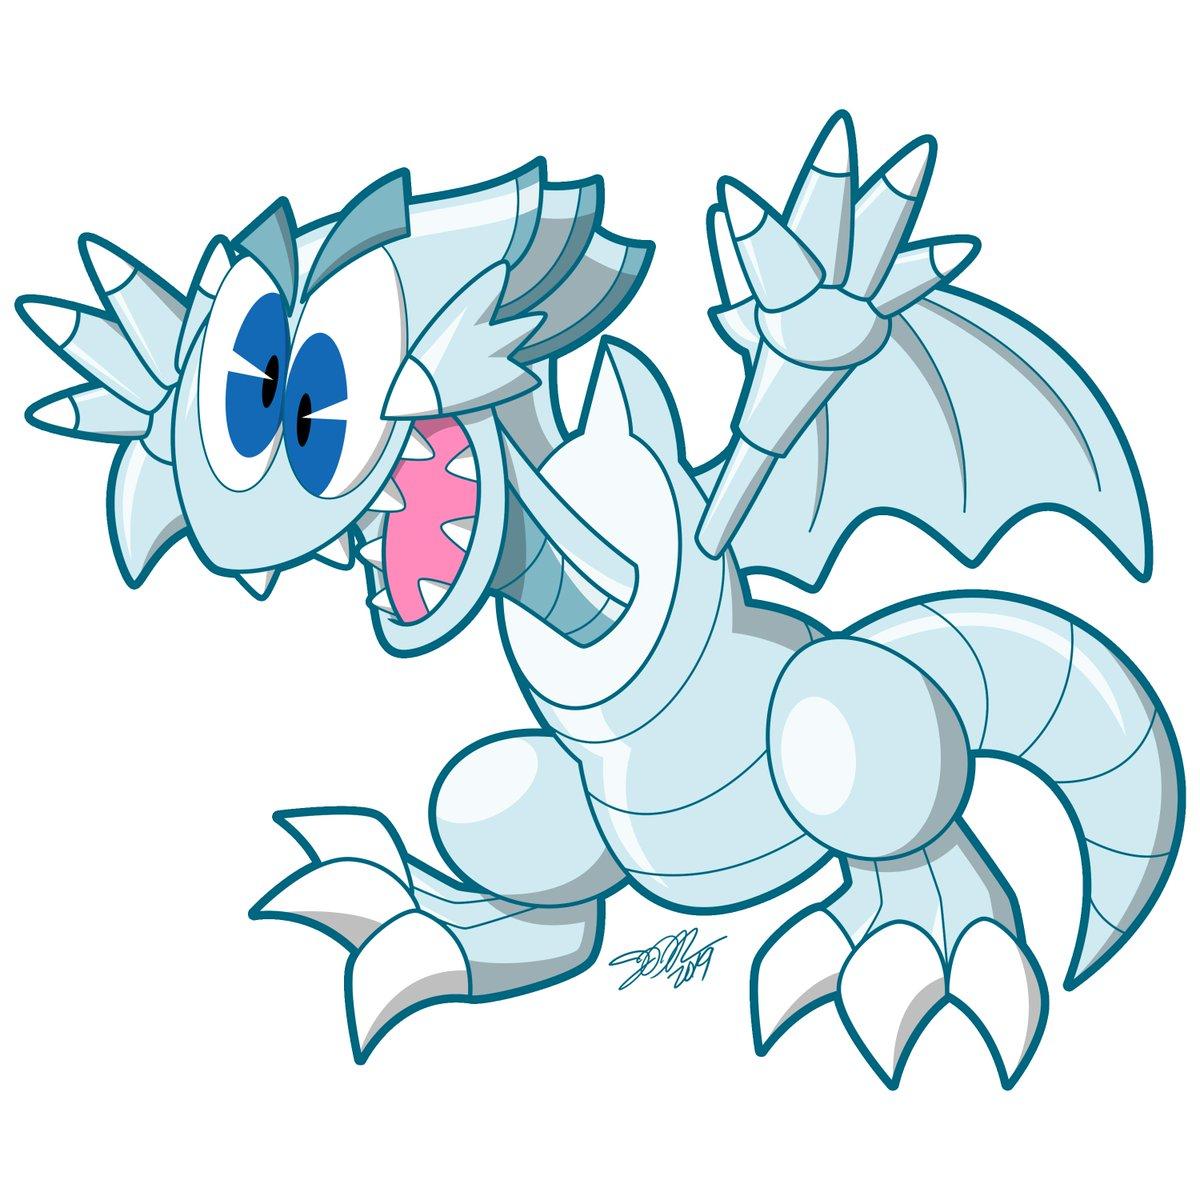 Heres a doofy Blue-Eyes Toon Dragon - #yugioh #anime #childrenscardgame #cartoon